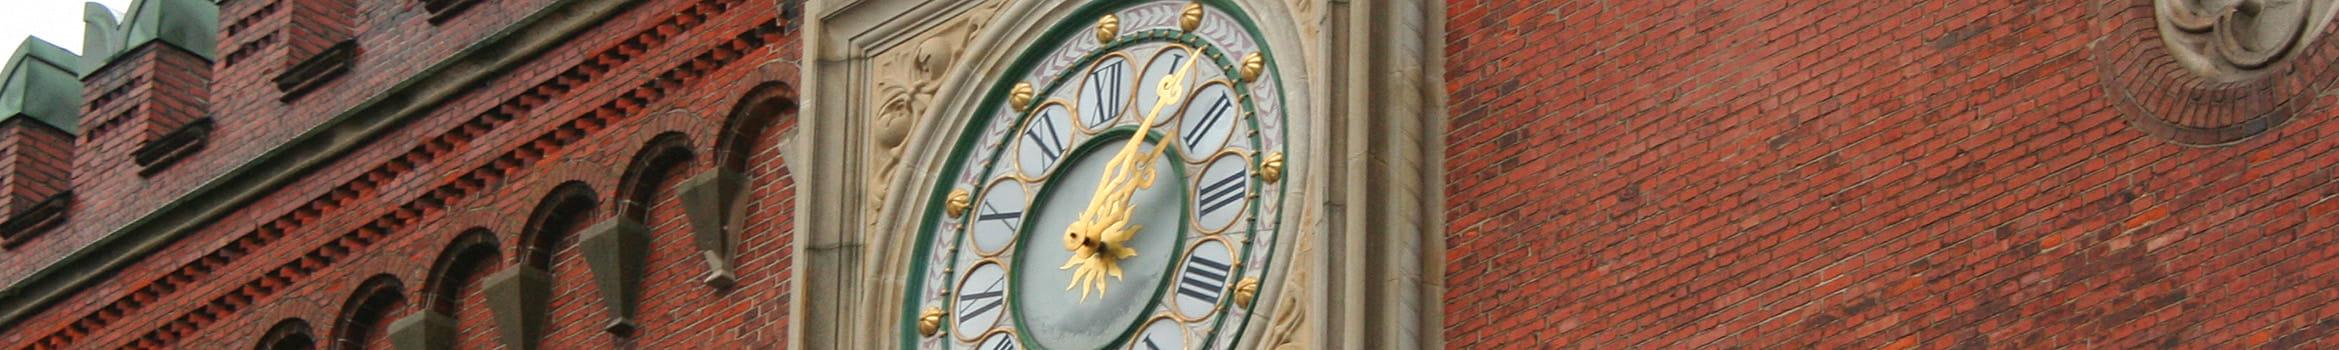 Rådhusets ur